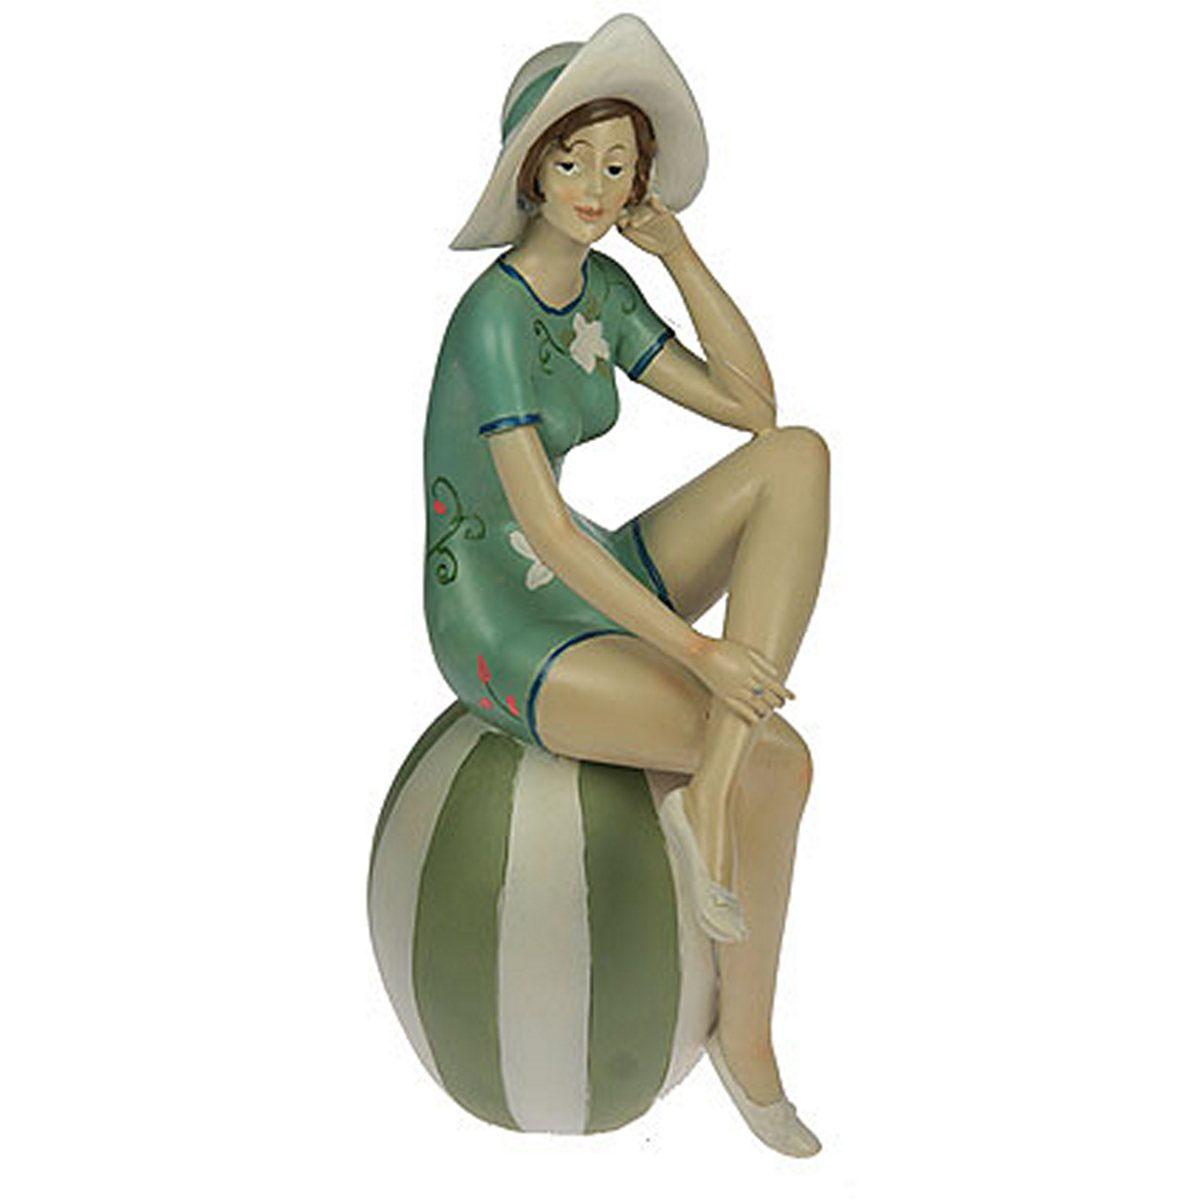 Статуэтка Русские Подарки Девушка на пляже, 15 х 11 х 30 см27559